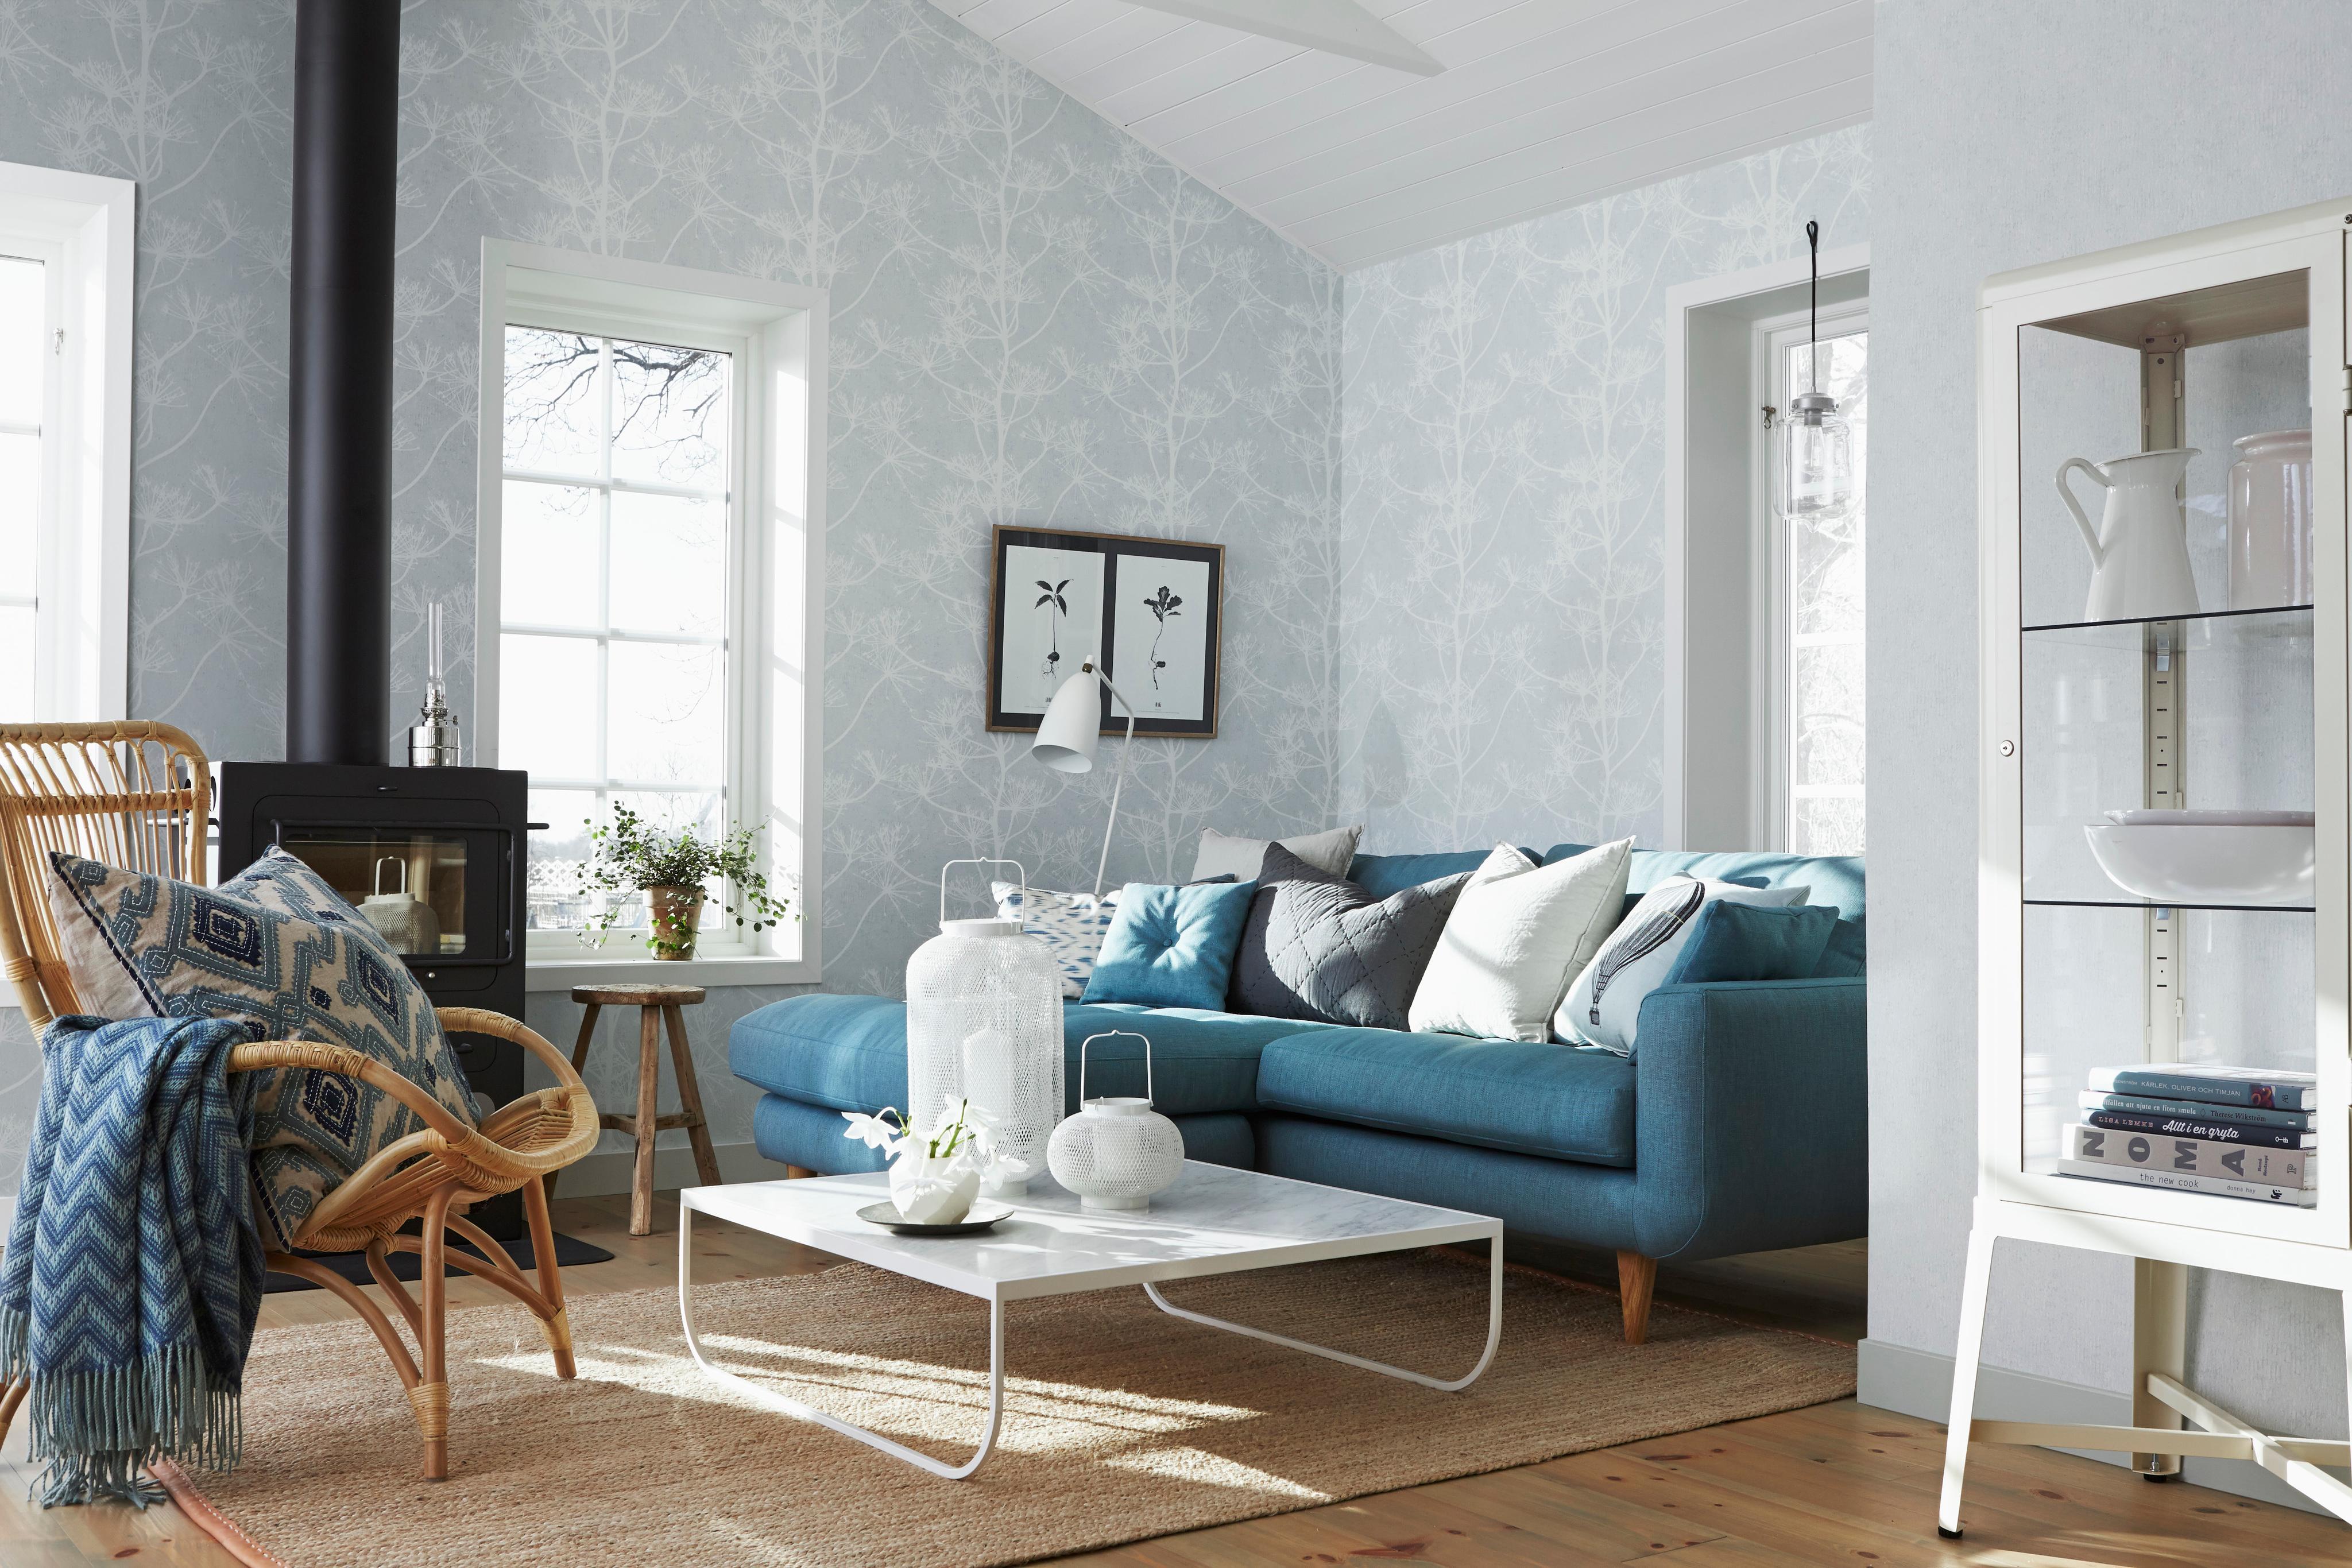 Blaues Sofa Bilder Ideen Couch